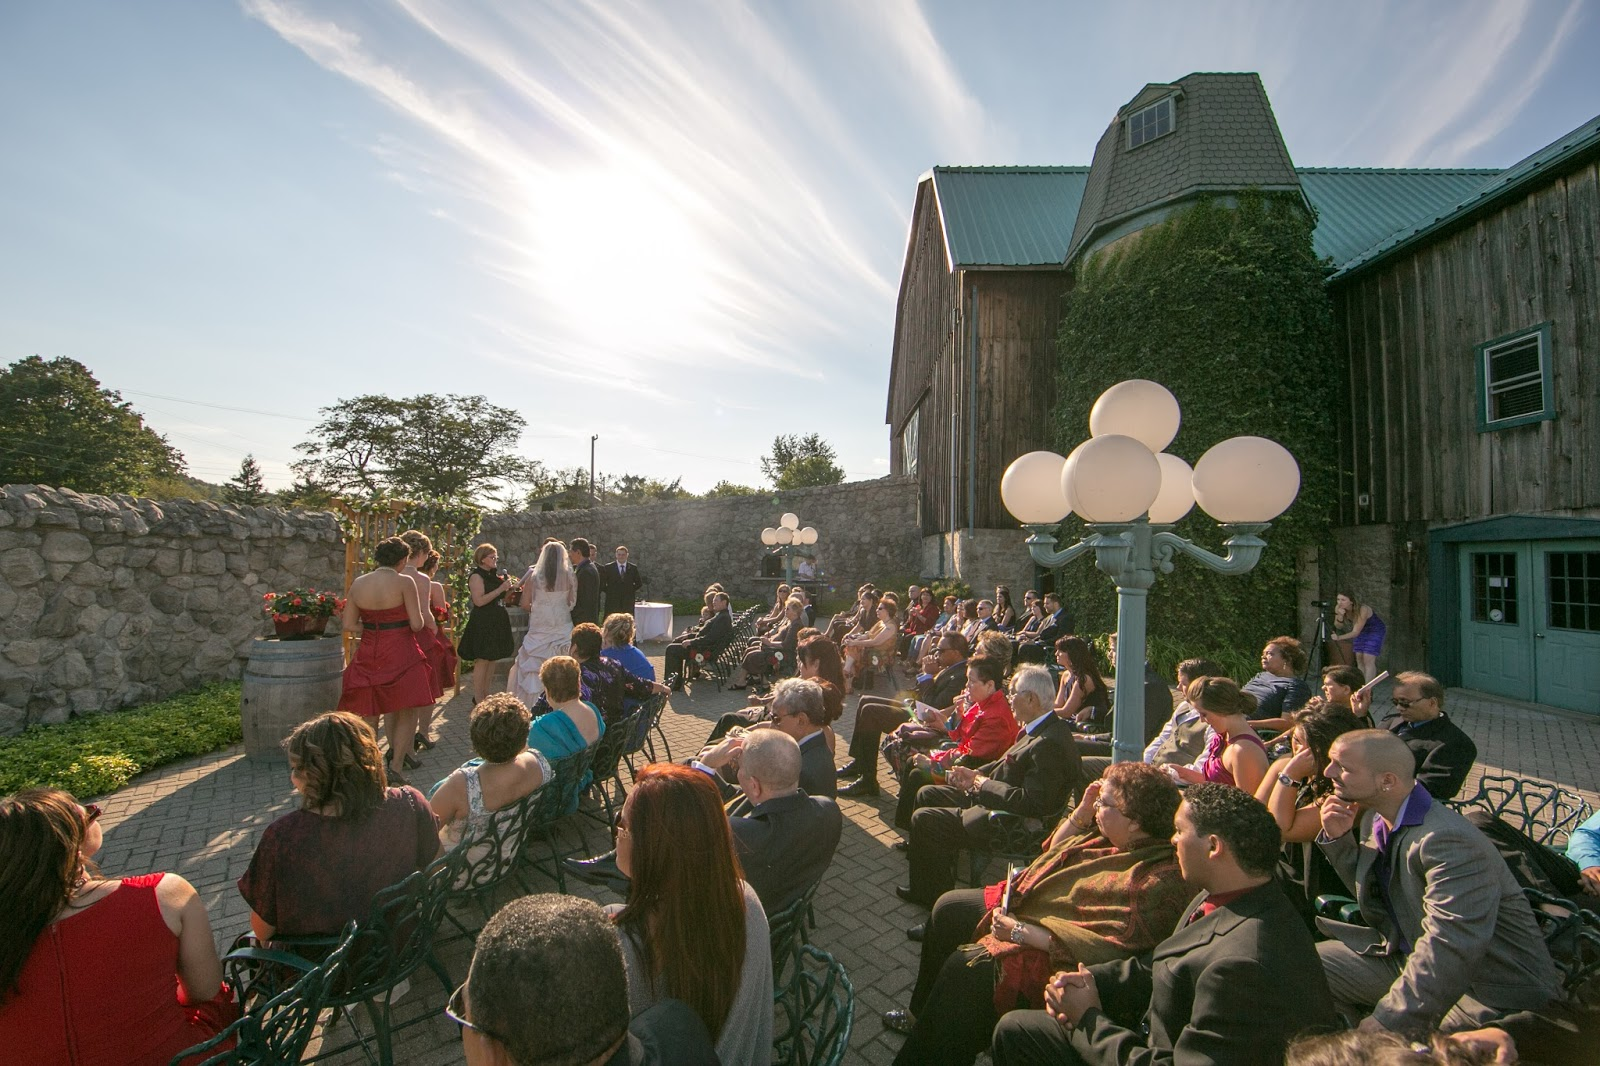 Niagara vineyard wedding inspiration // the-lifestyle-project.com